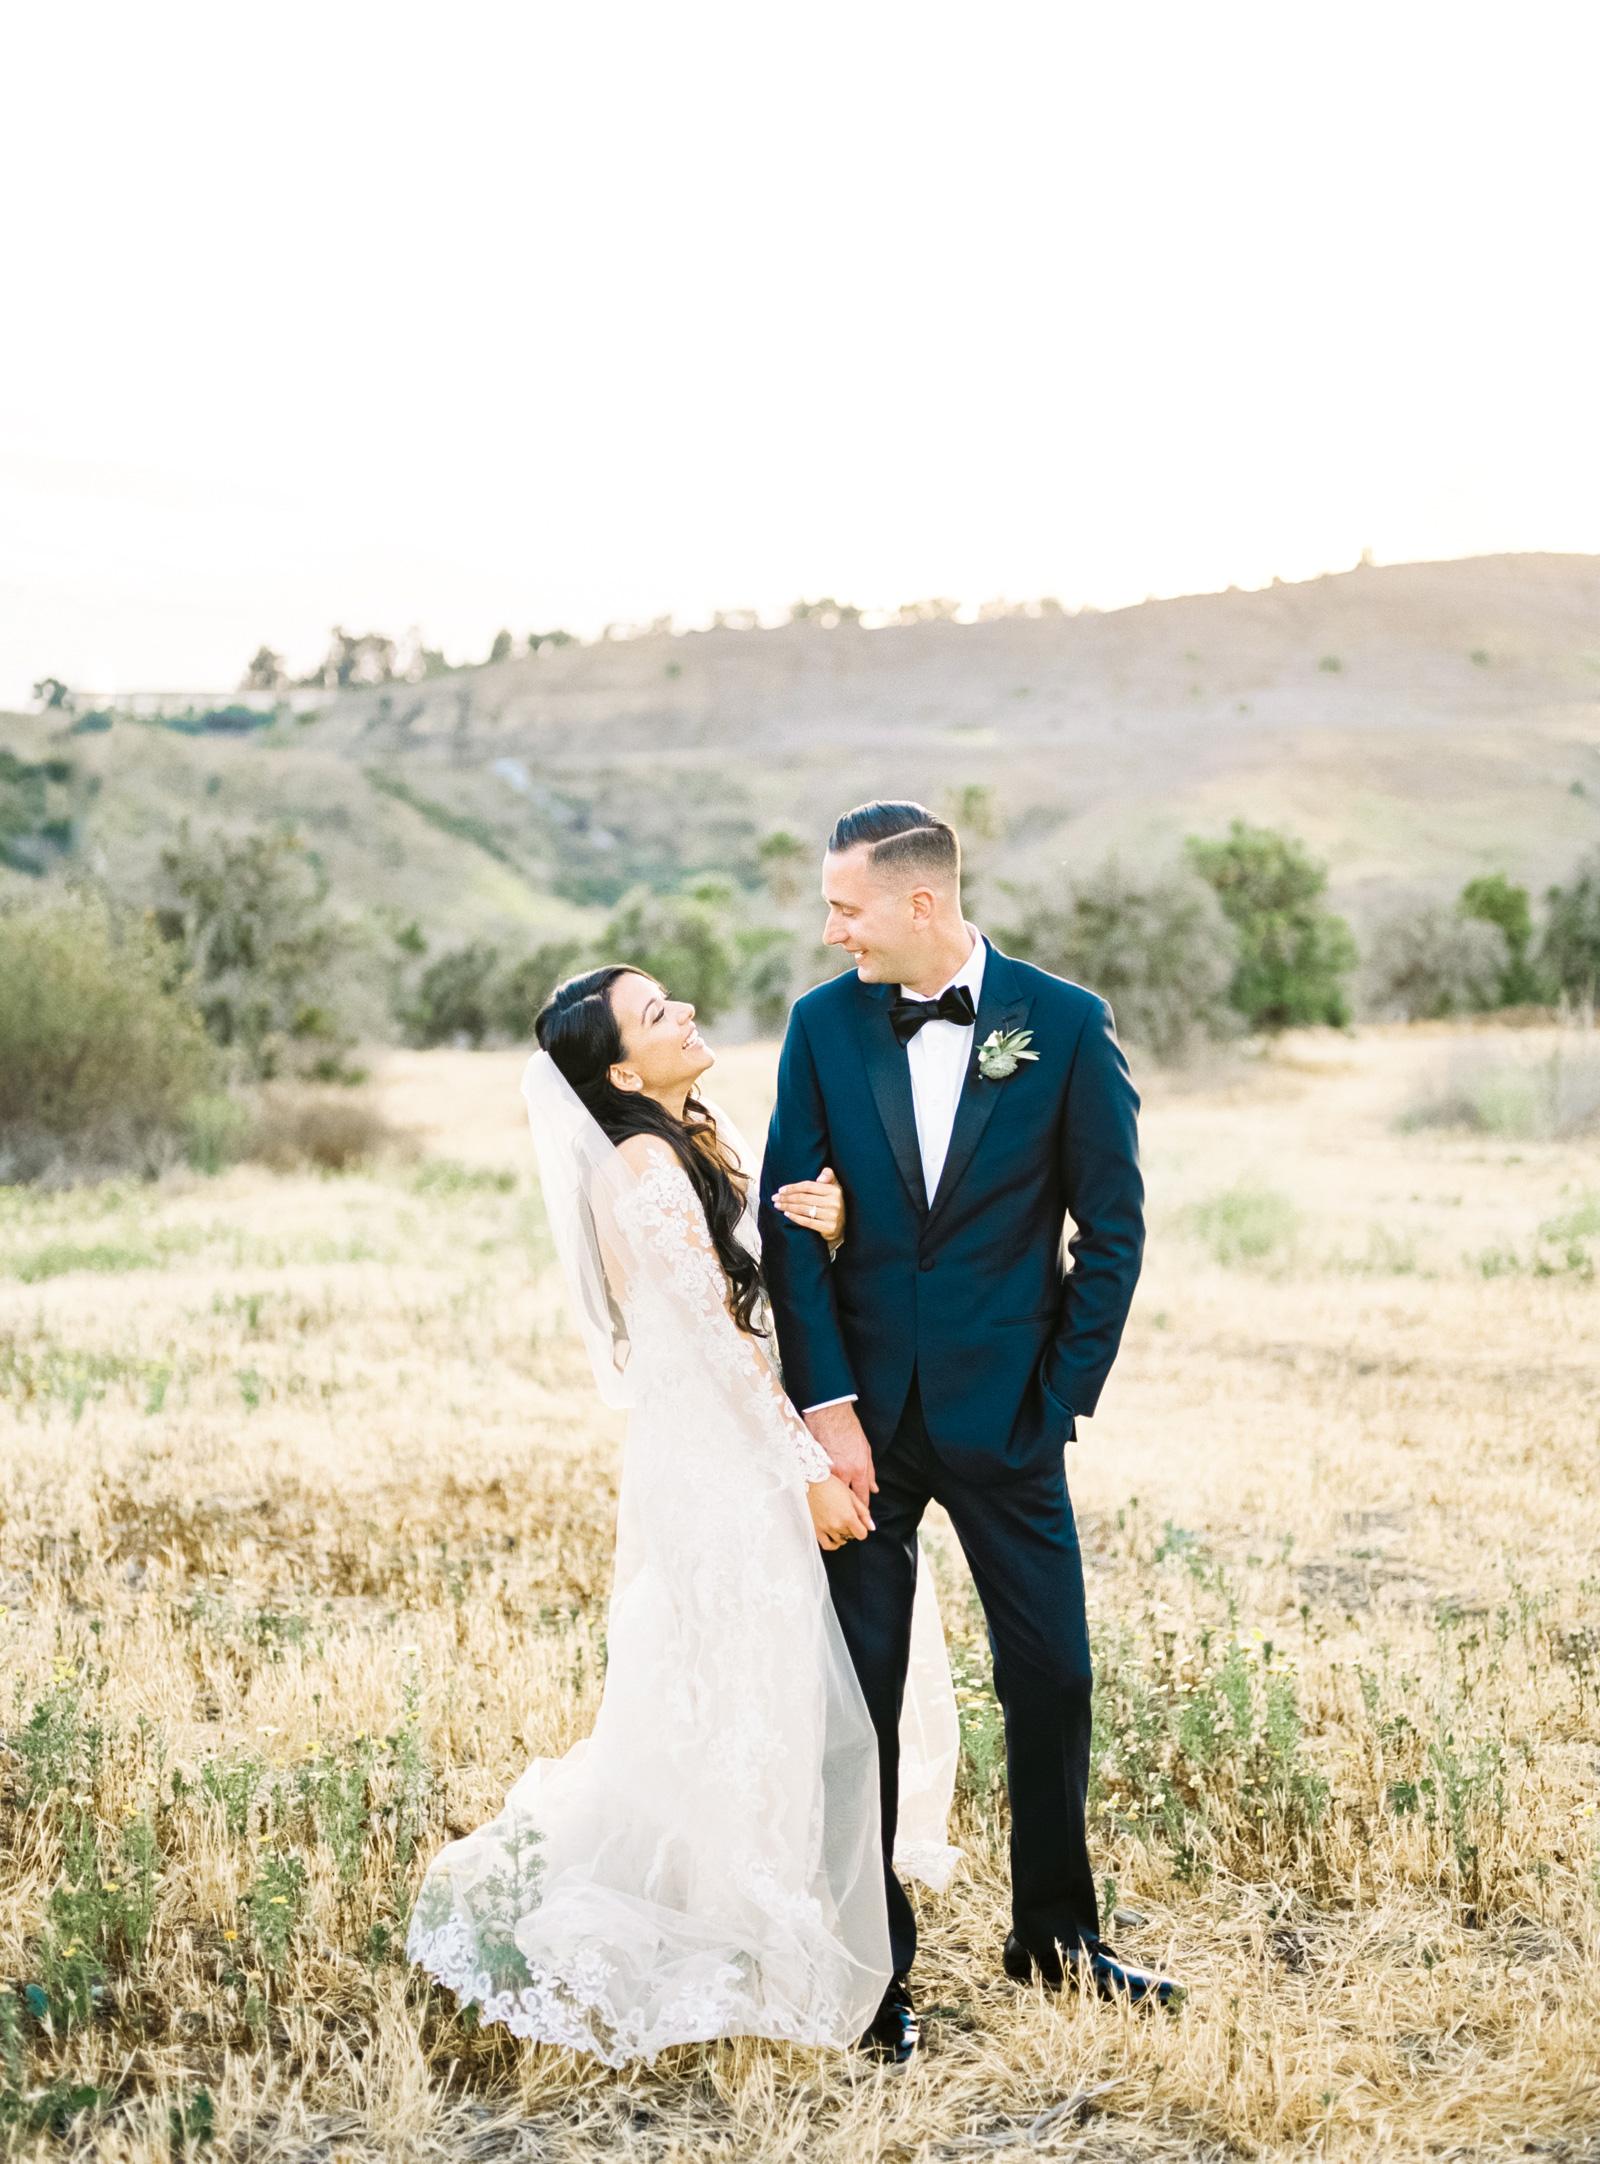 Malibu-Weddings-Natalie-Schutt-Photography_05.jpg